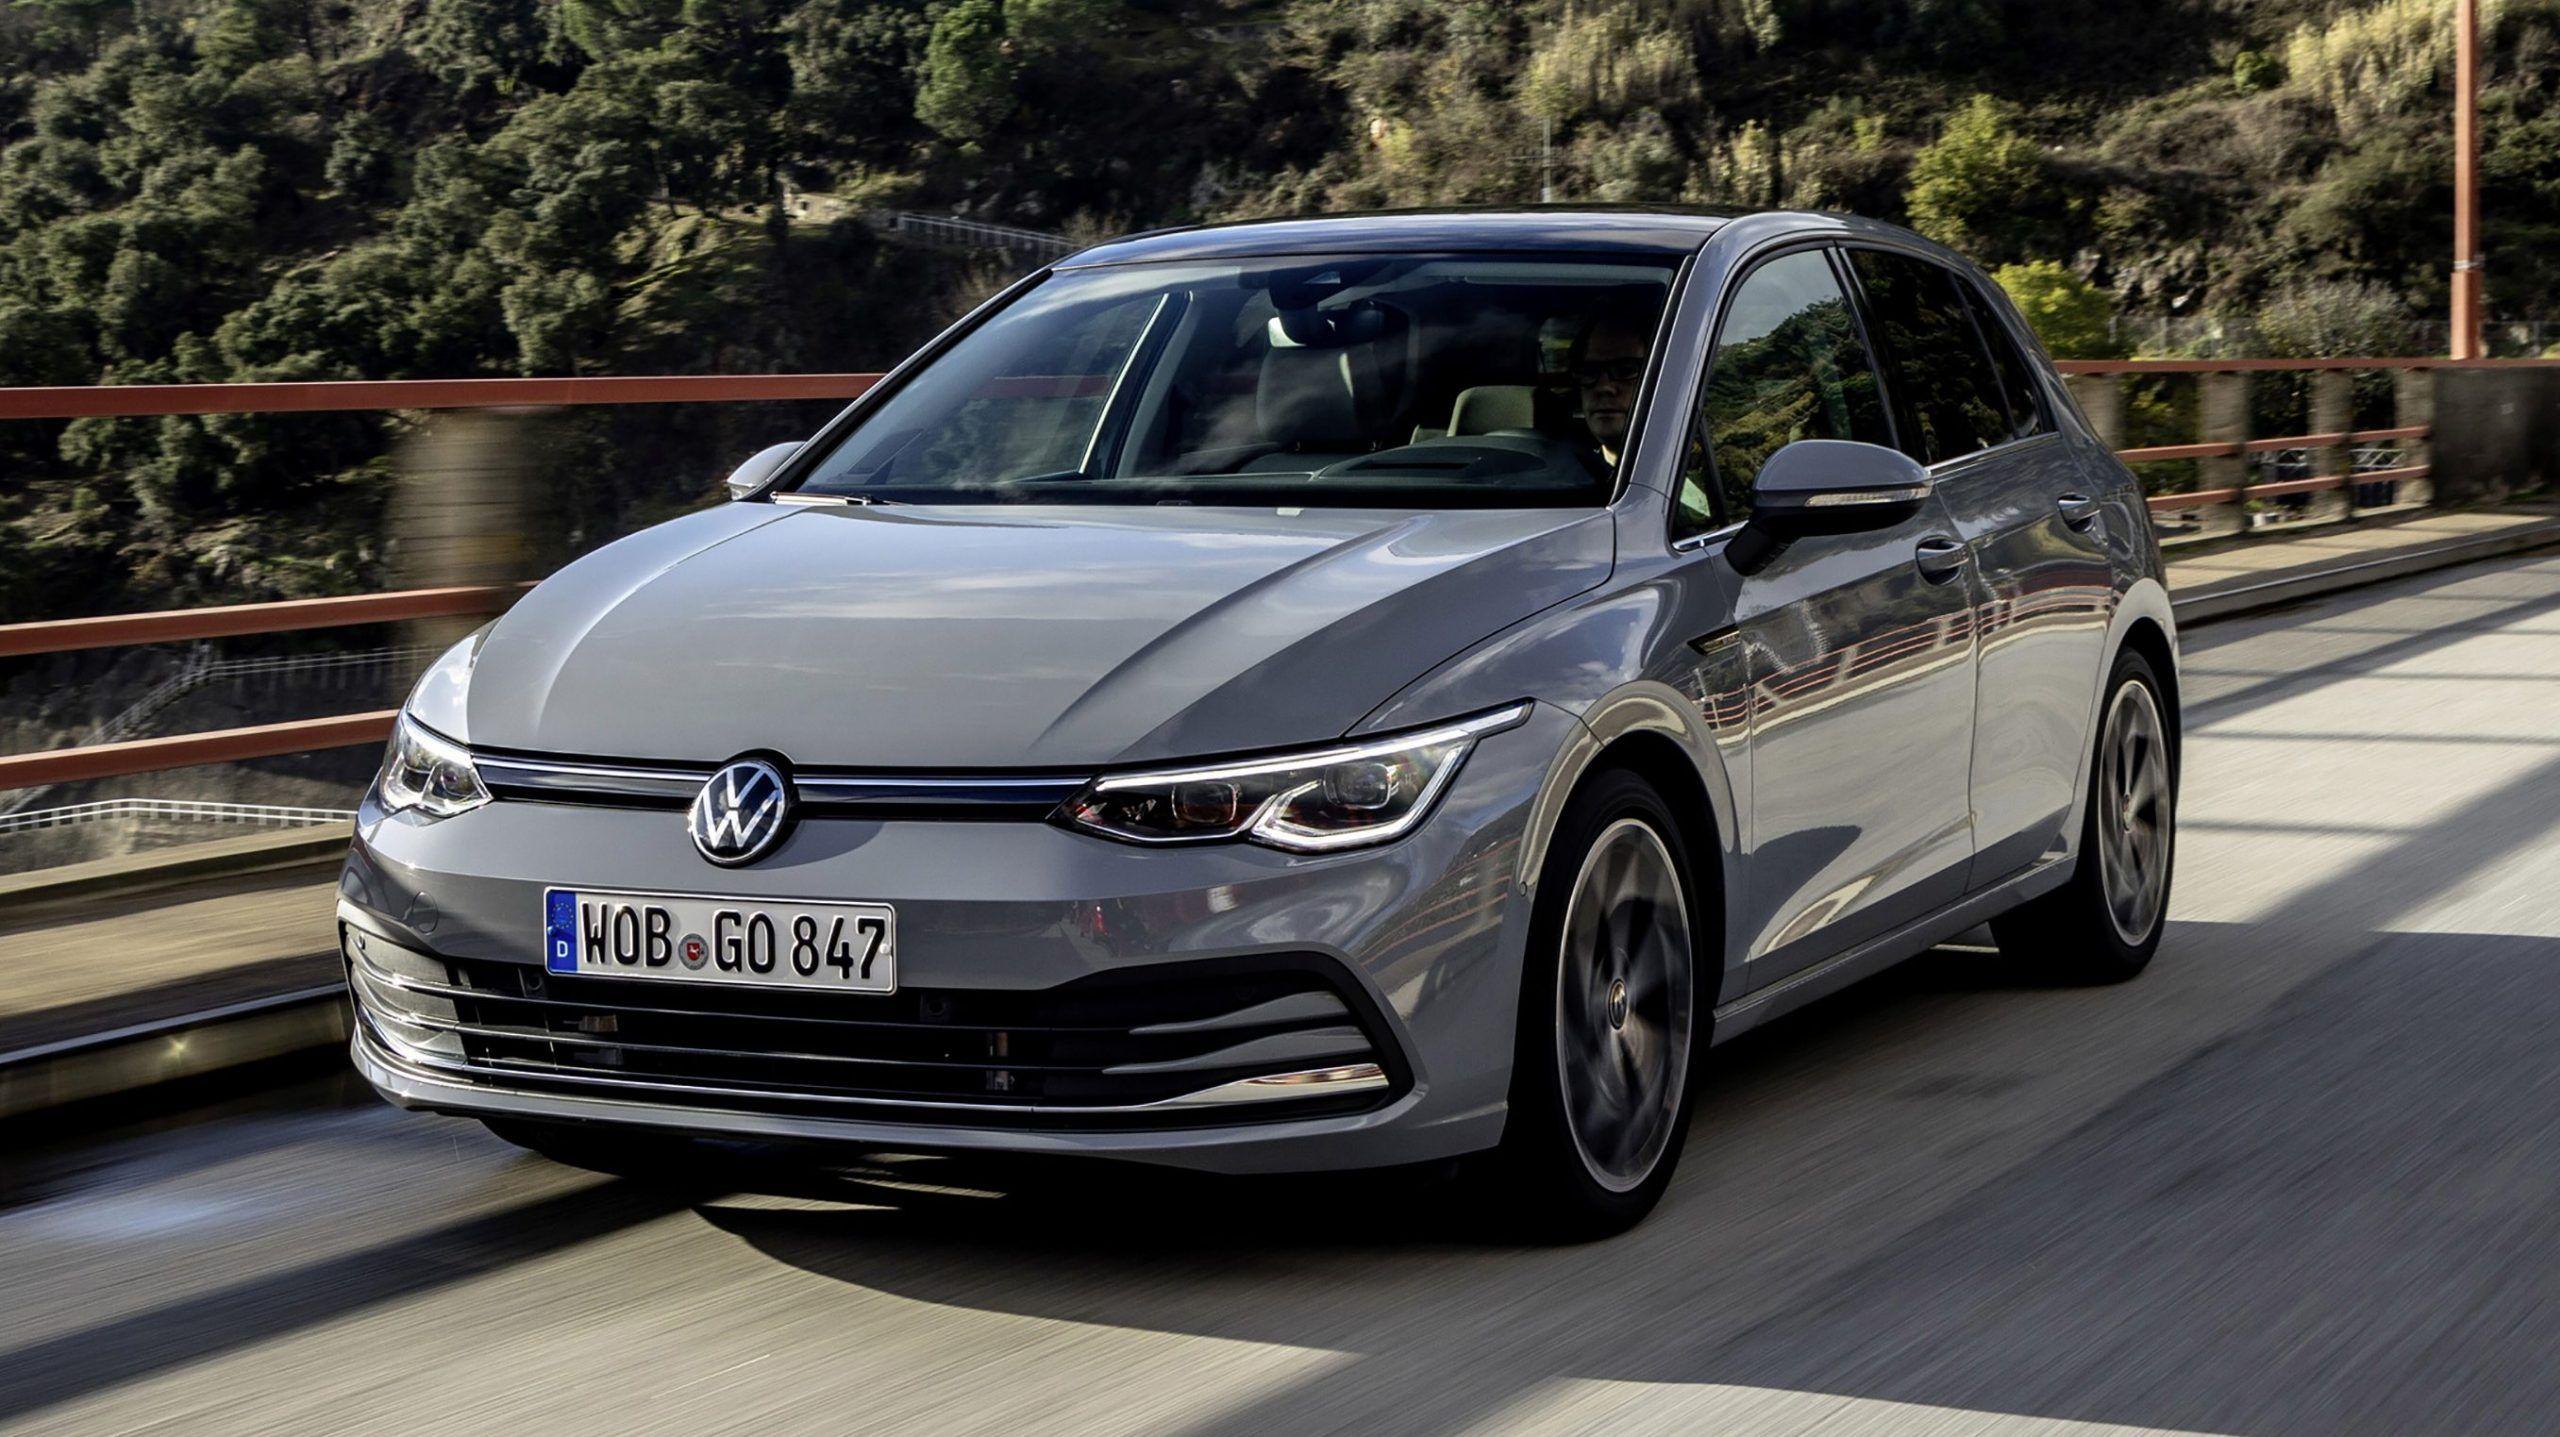 [Privatleasing] VW Golf eHybrid, 99 Euro/Monat, 24 Monate, ÜF 799€, LF 0,24